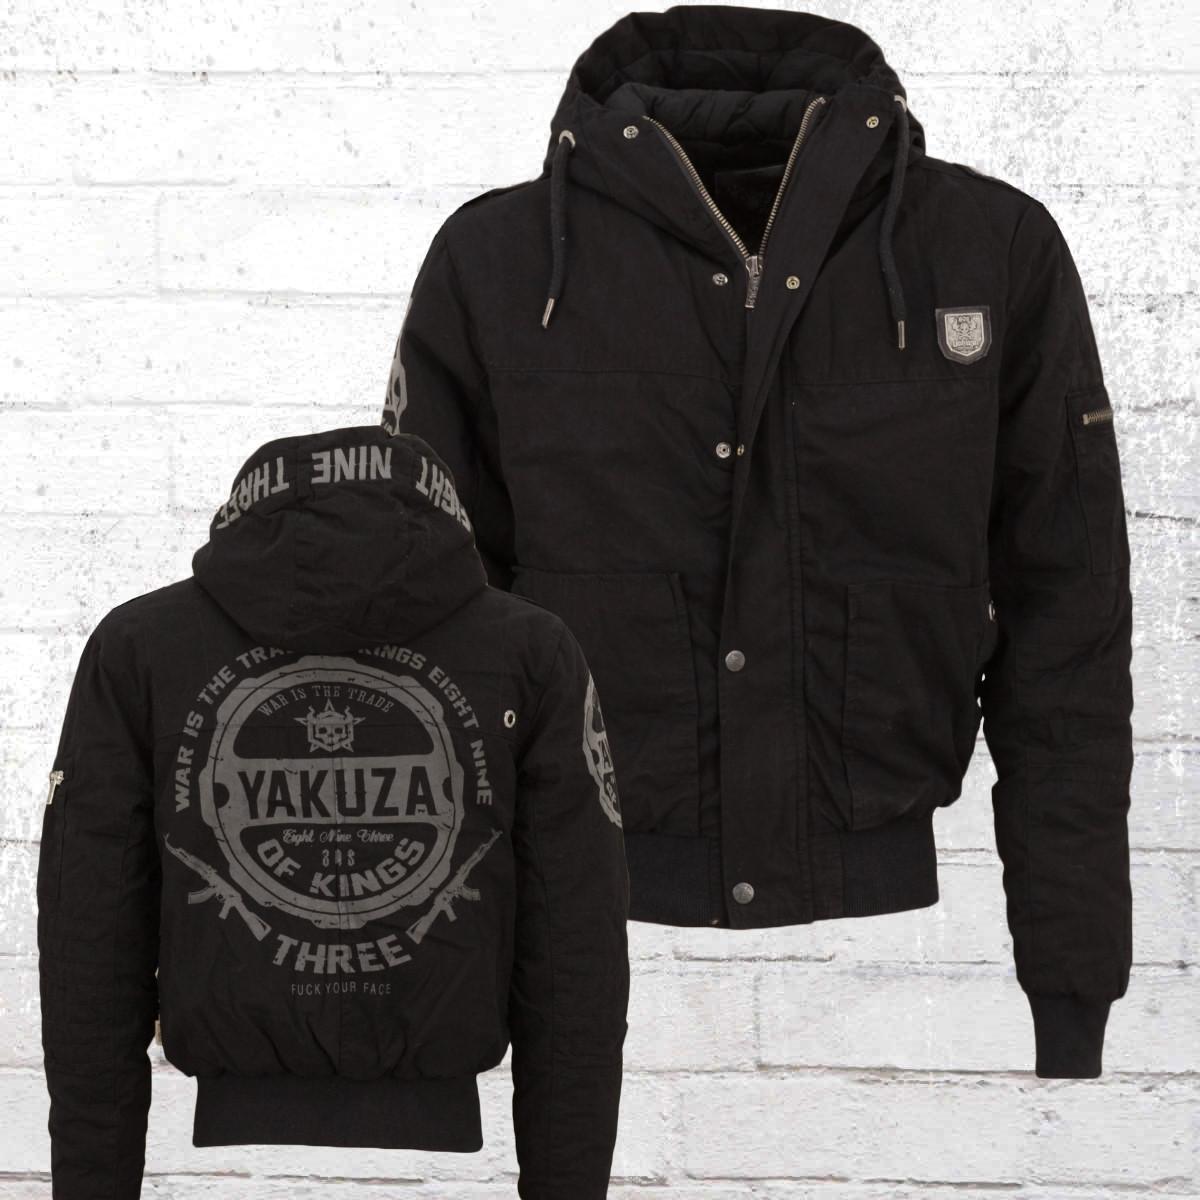 jetzt bestellen yakuza herren winter jacke trade of kings 11027 schwarz krasse. Black Bedroom Furniture Sets. Home Design Ideas